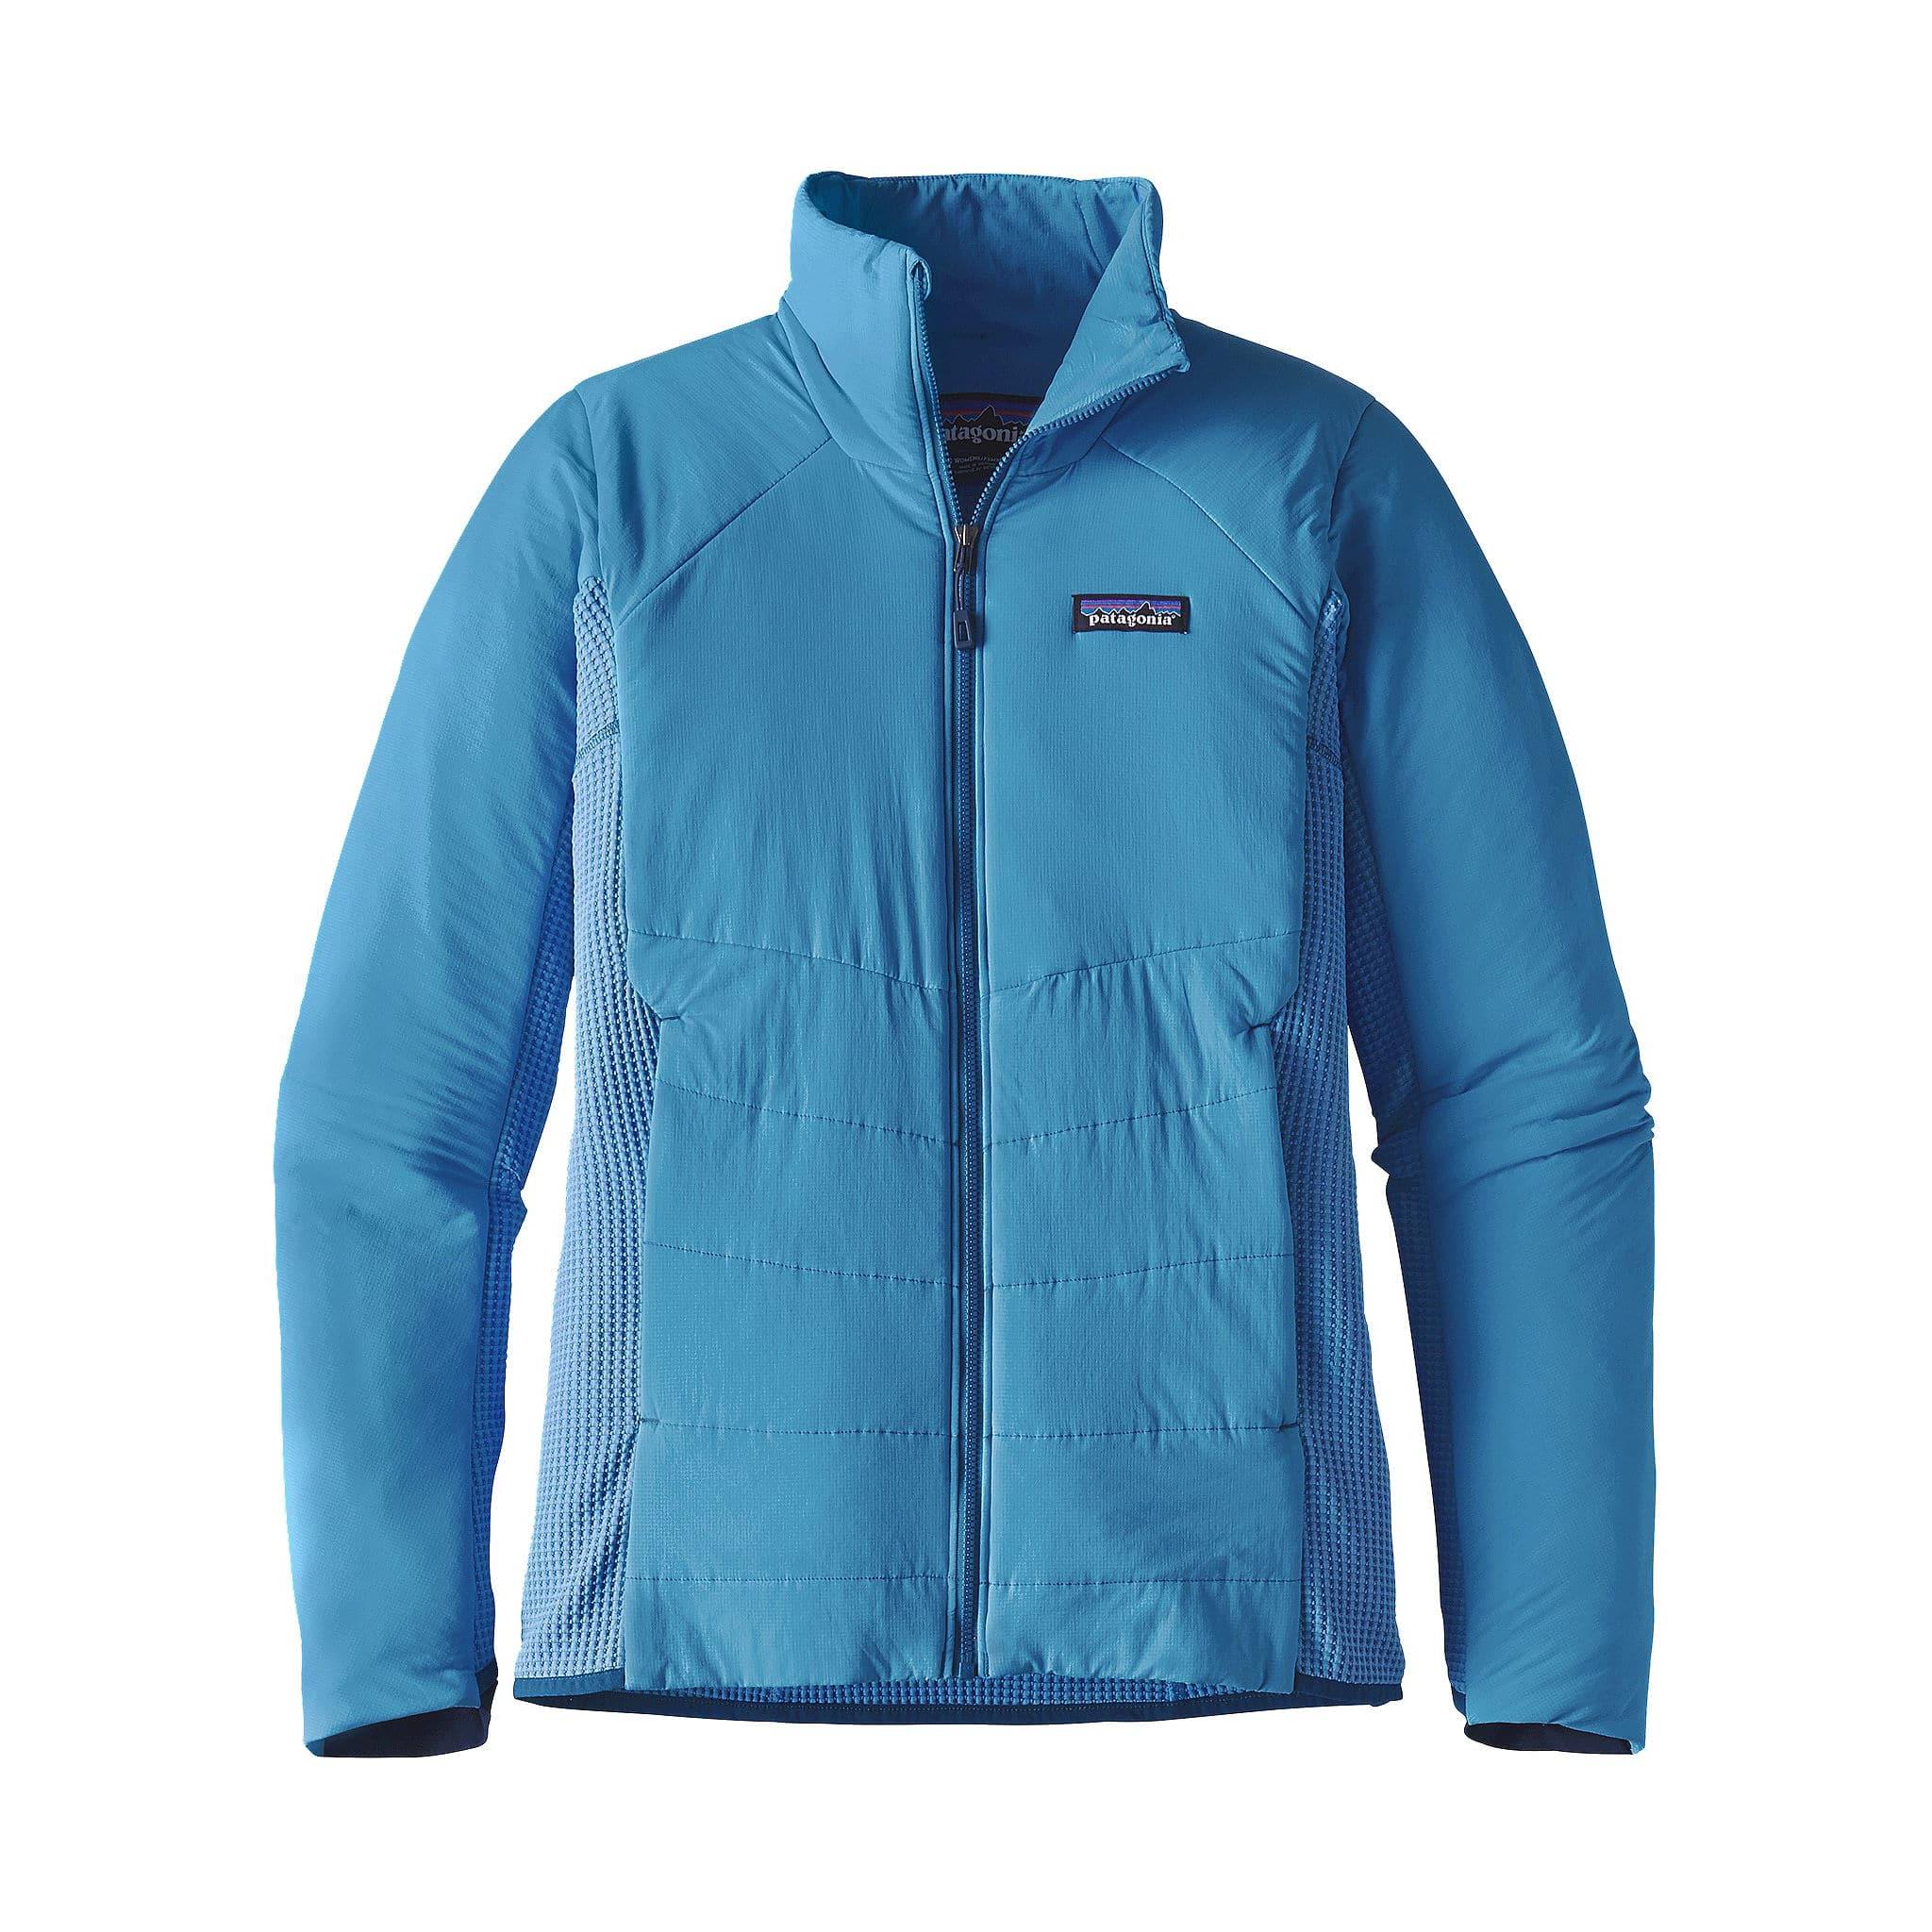 Varm, lett, stretchy og pustende jakke for aktive dager i kulda